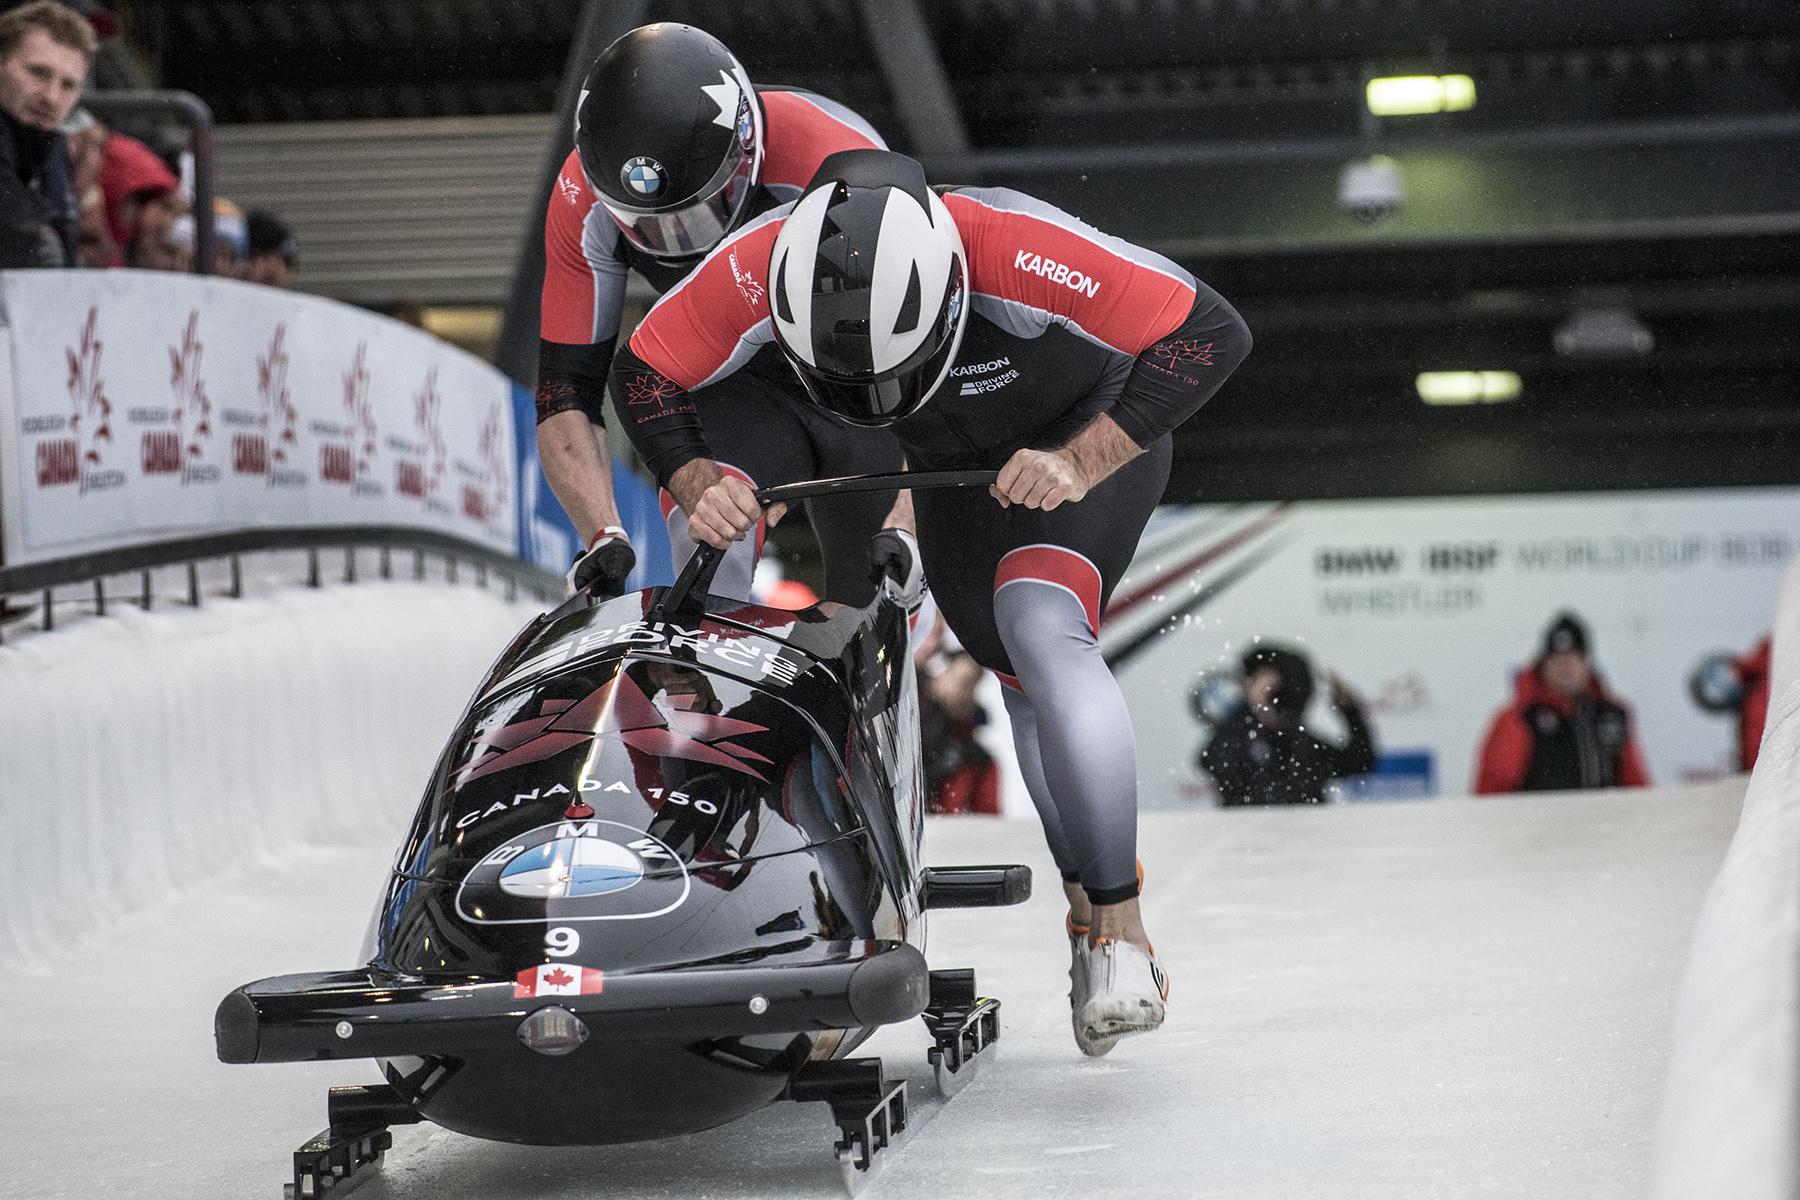 Team Canada - Justin Kripps and Alexander Kopacz start their run